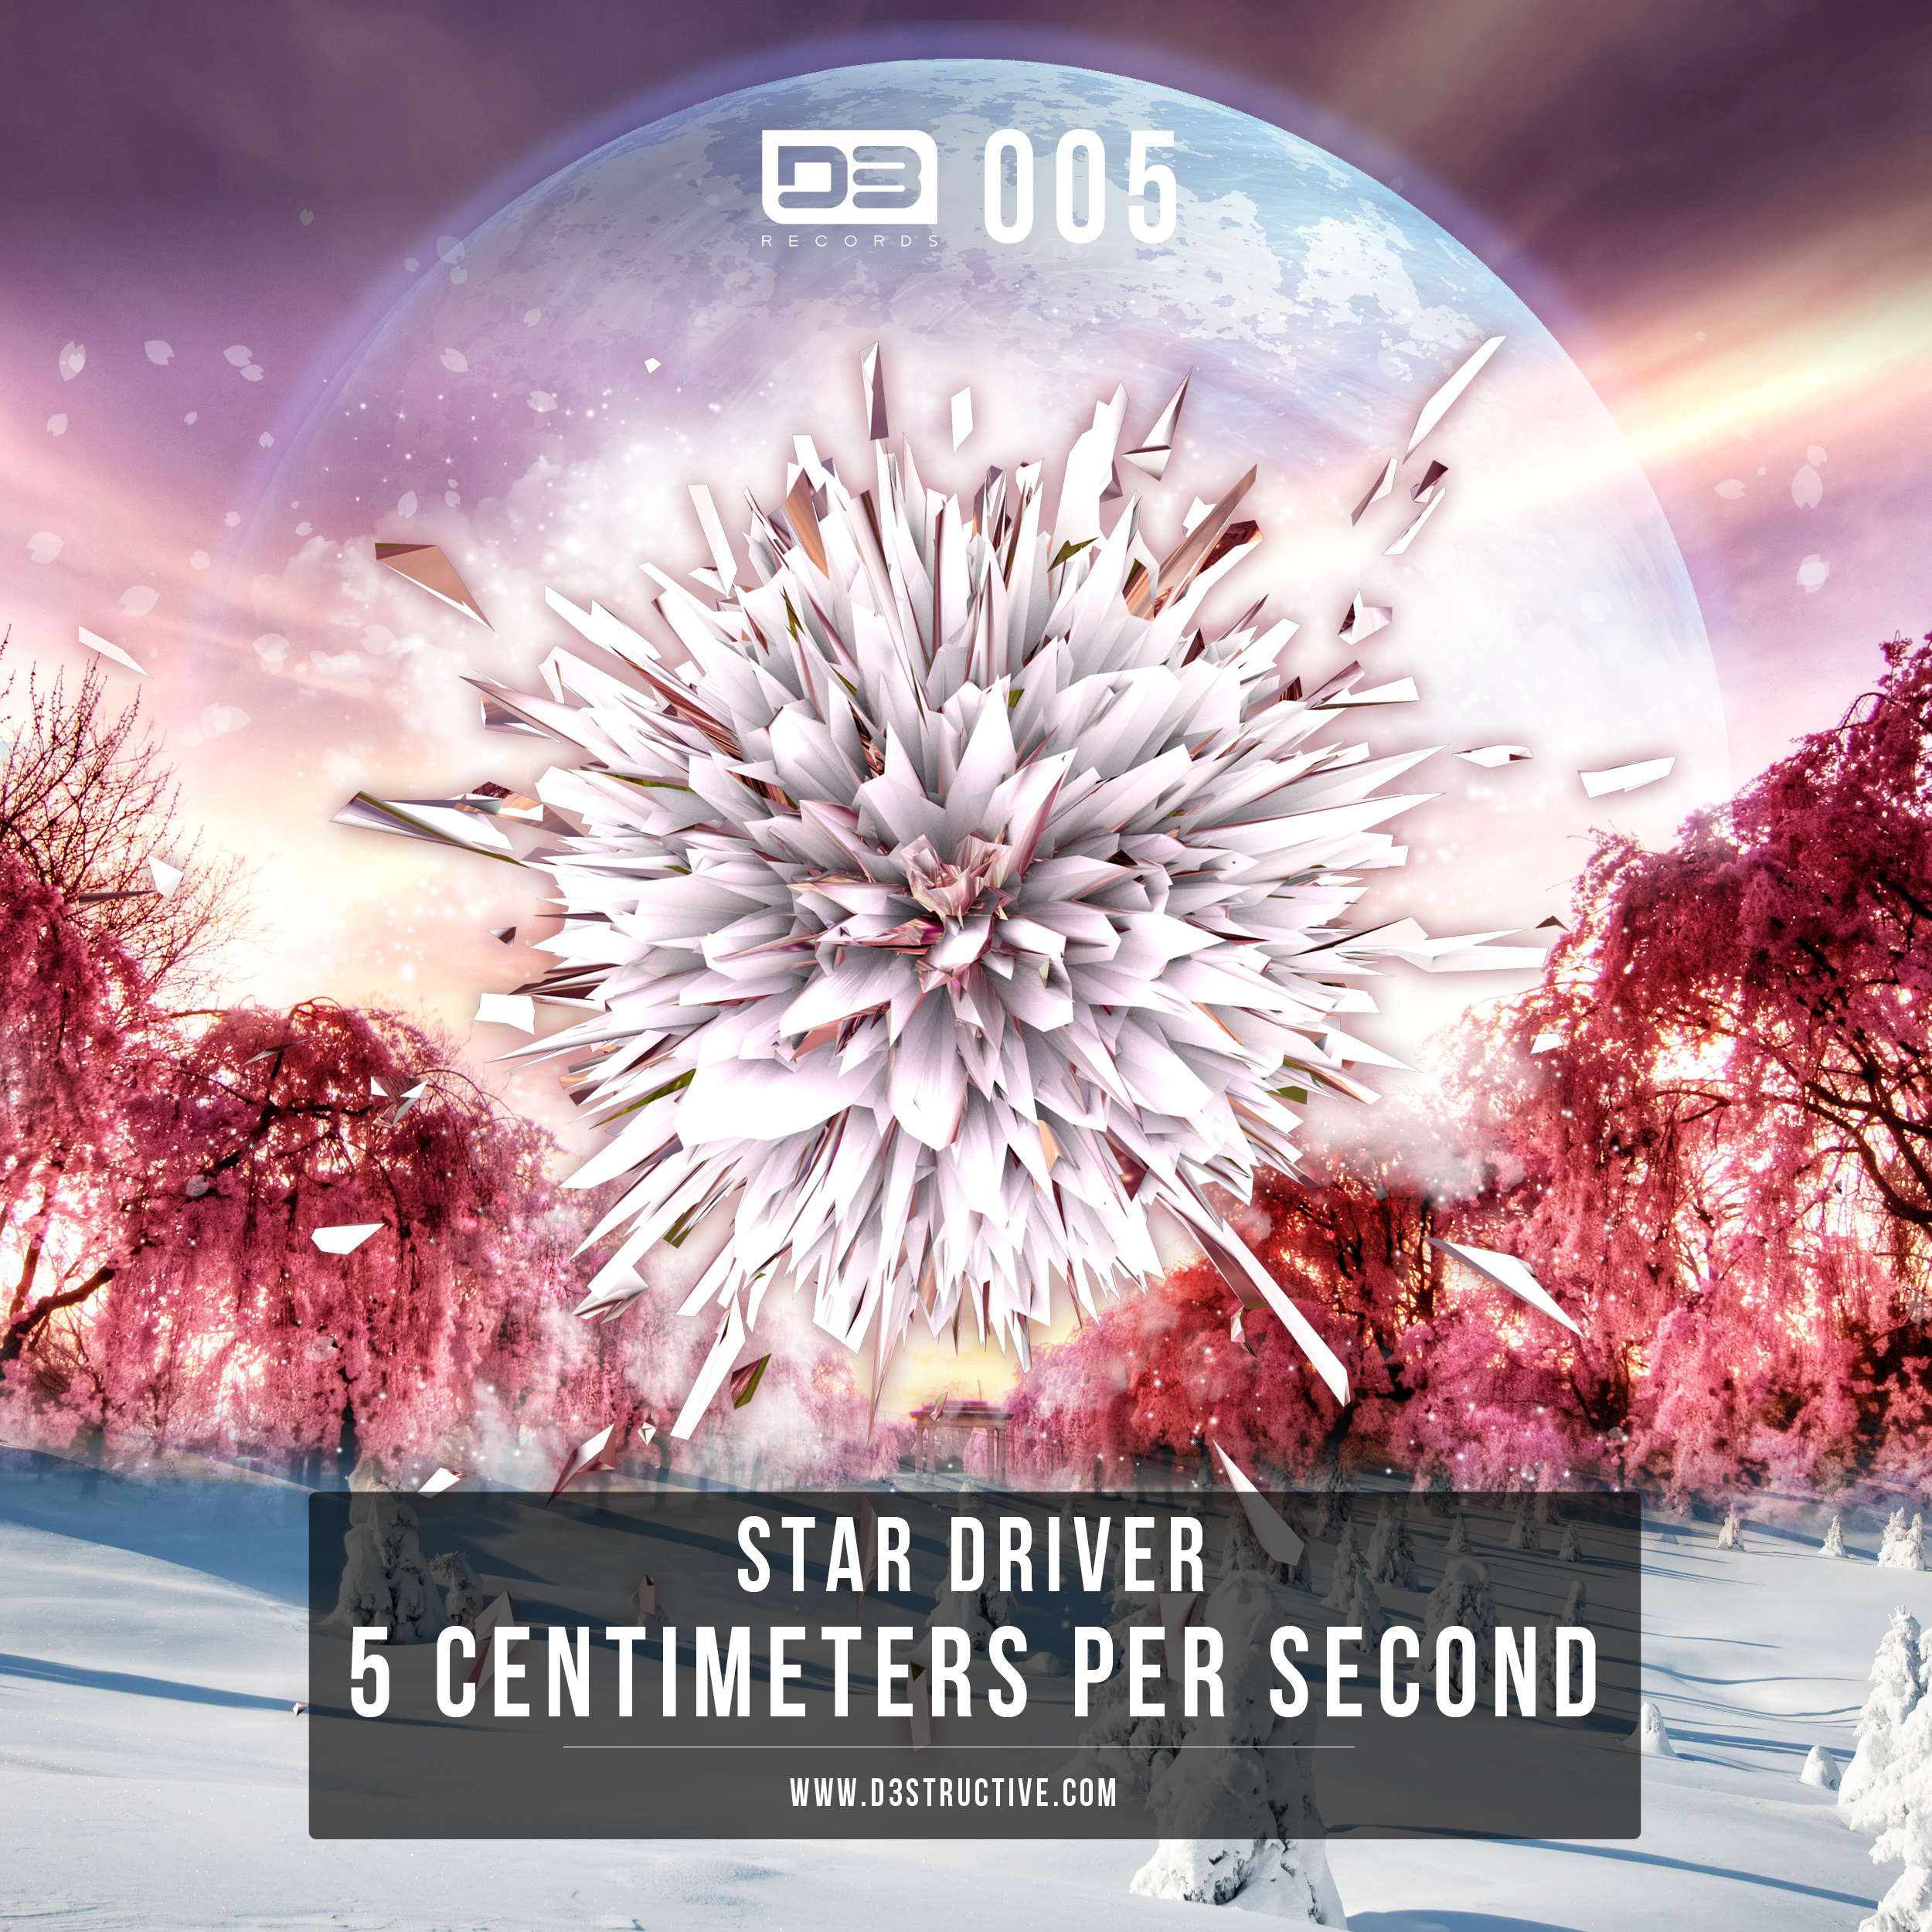 X 2500 Image Tracklist 01 Star Driver 5 Centimeters Per Second